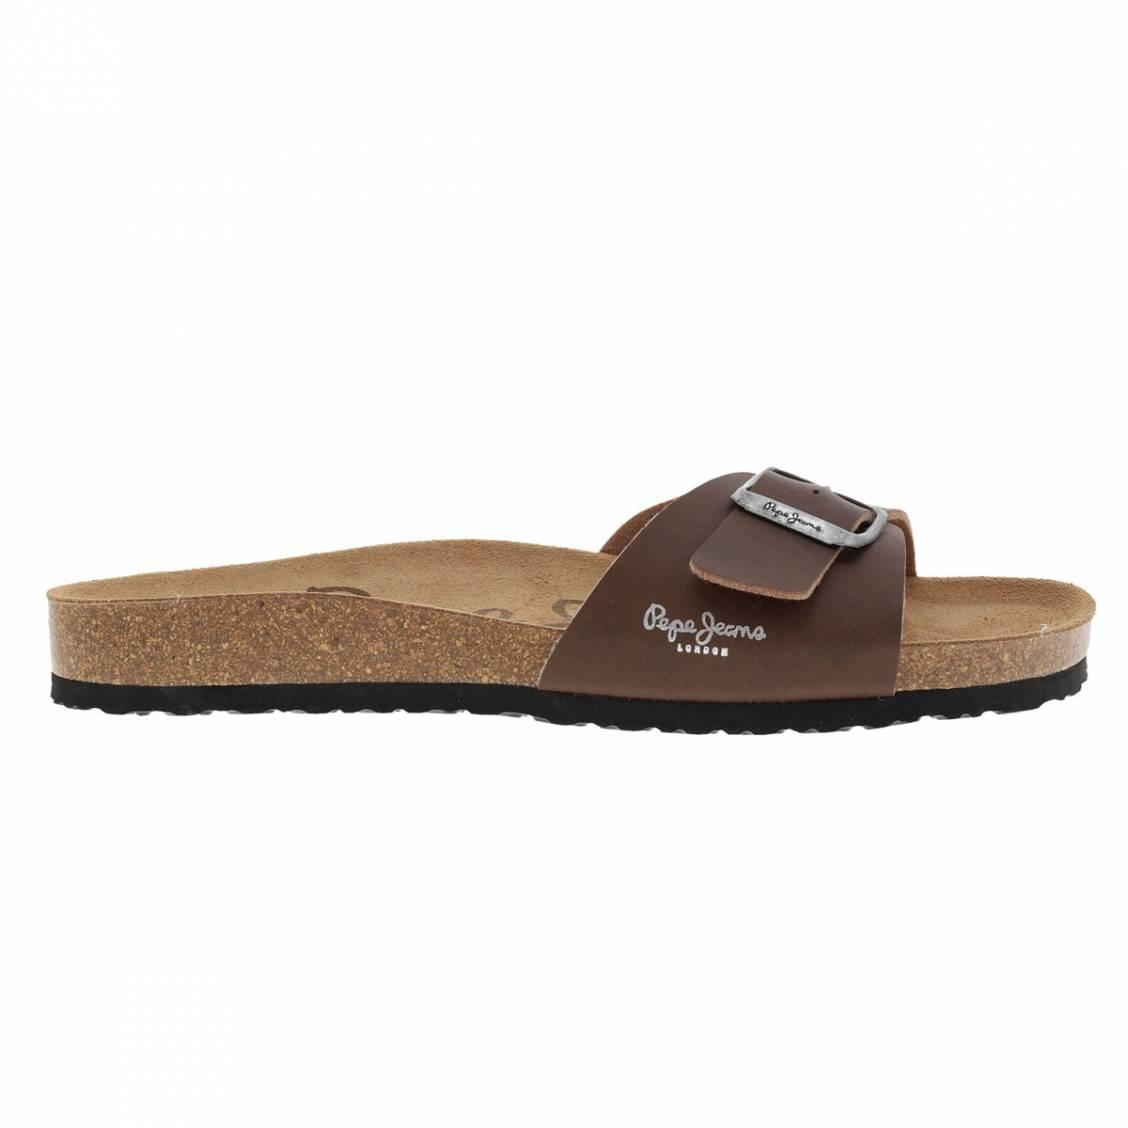 Sandales pepe jeans bio marrons